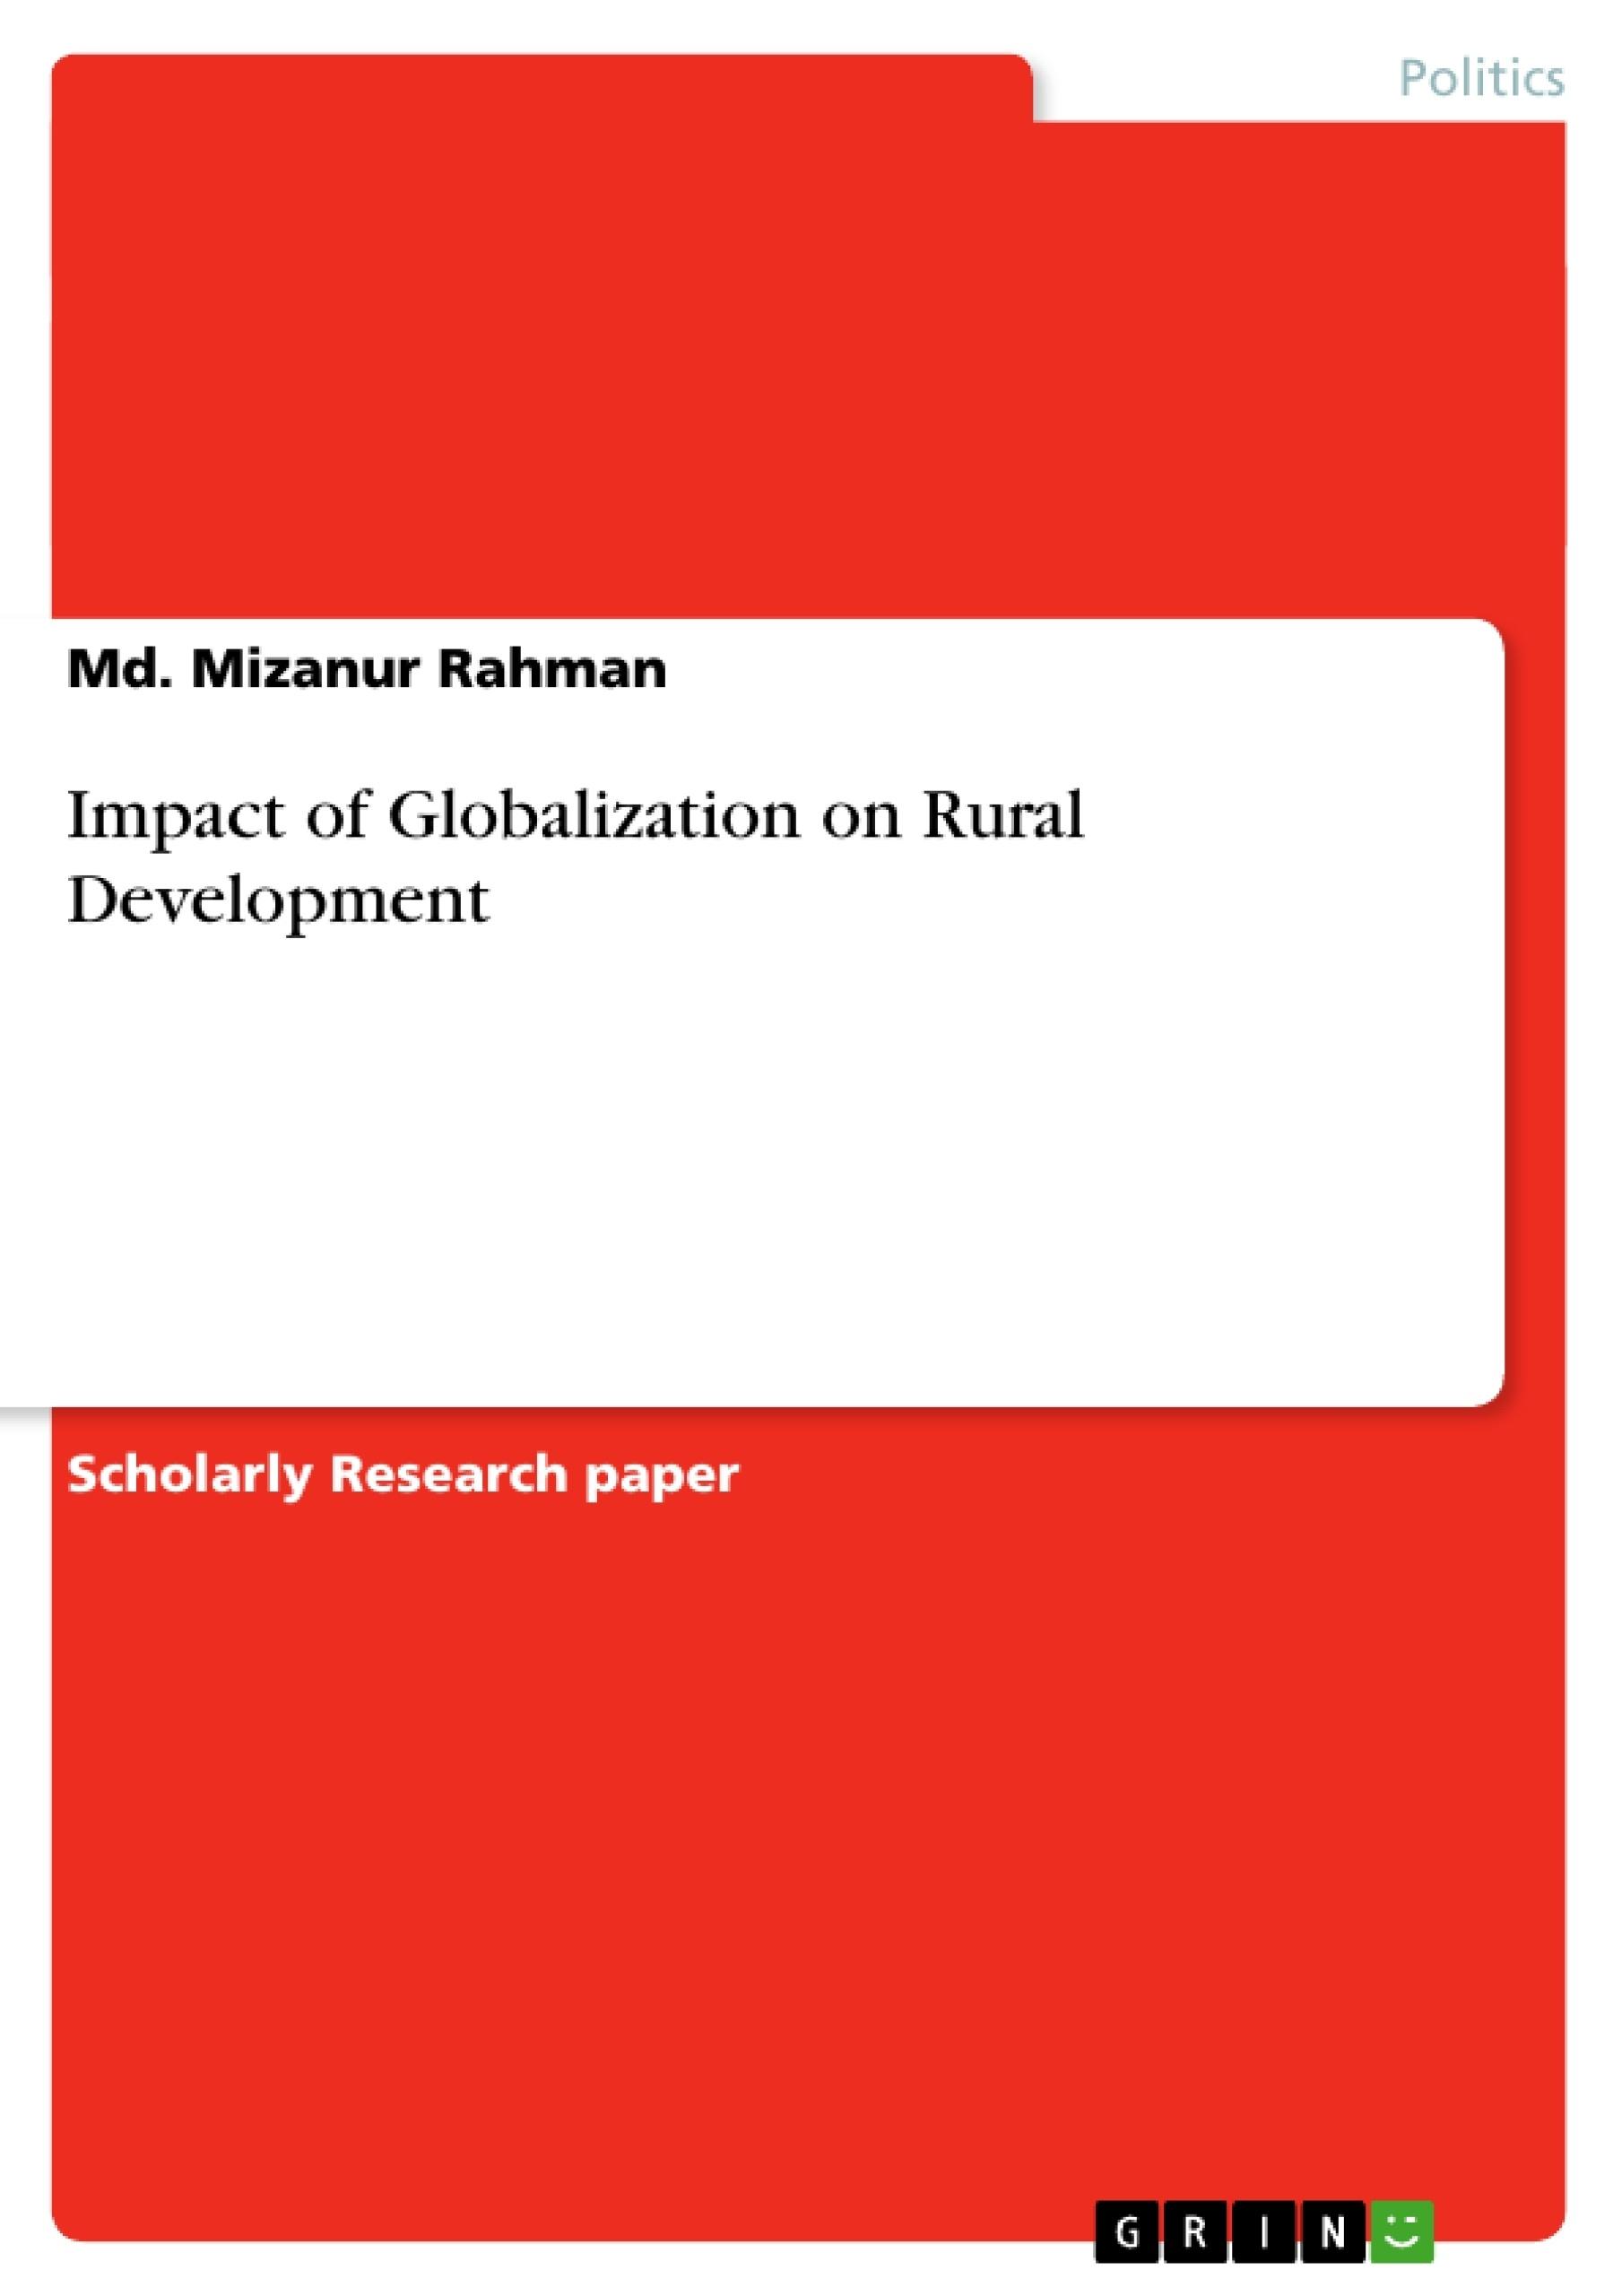 essay on human development in india